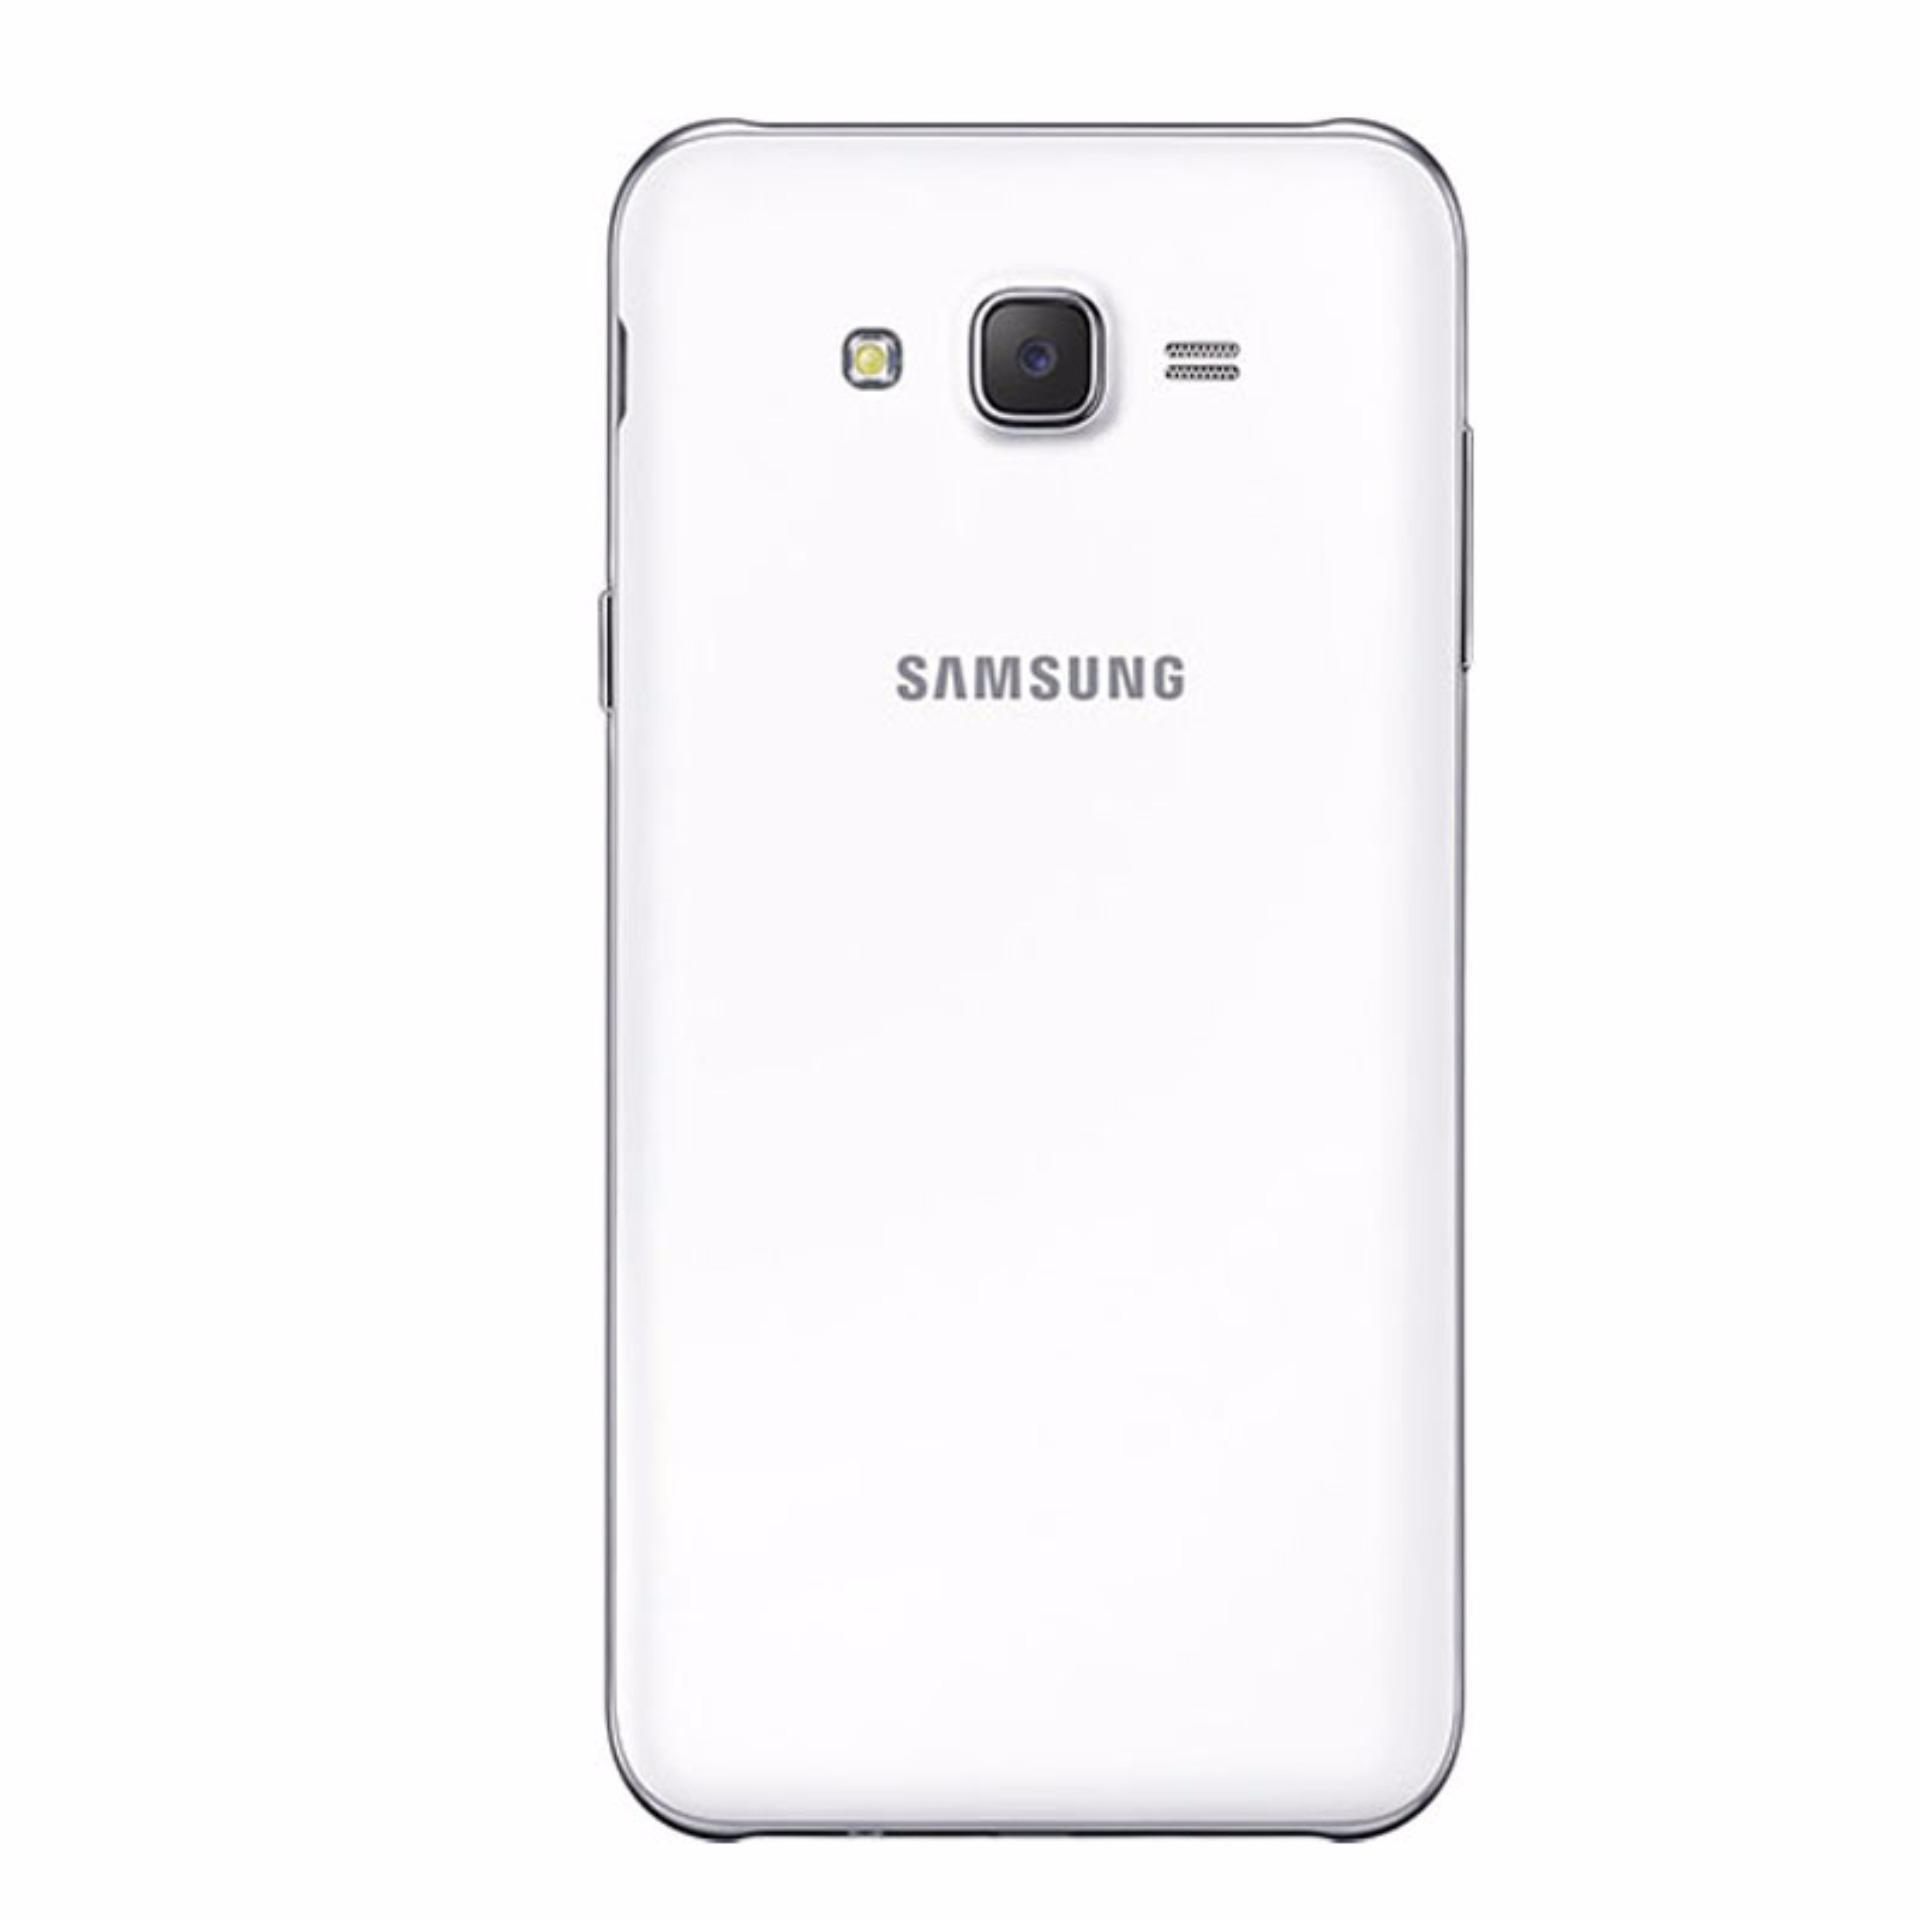 Flash Sale Samsung Galaxy J5 Lama Back Cover Tutup Belakang Backdoor Casing Baterai J2 Tutupbaterai Putih